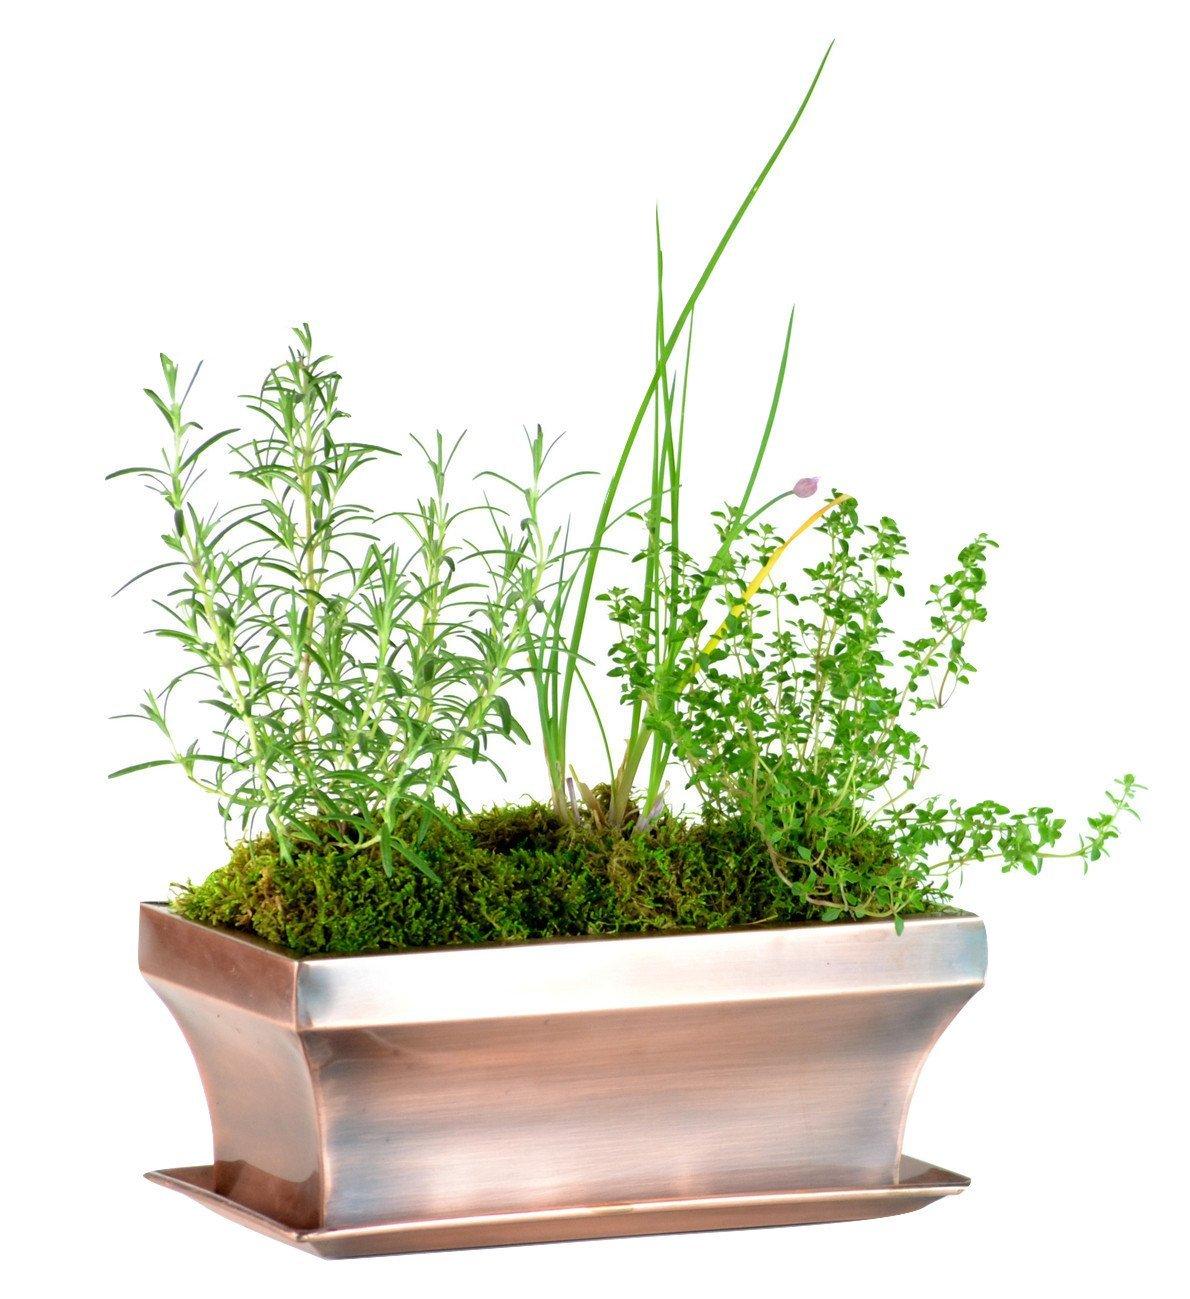 H Potter Rectangular Planter with Antique Copper Finish, Indoor Outdoor Garden Pot & Plant Window Box for Succulent Flowers & More, 12'' x 6'' x 6'', GAR554